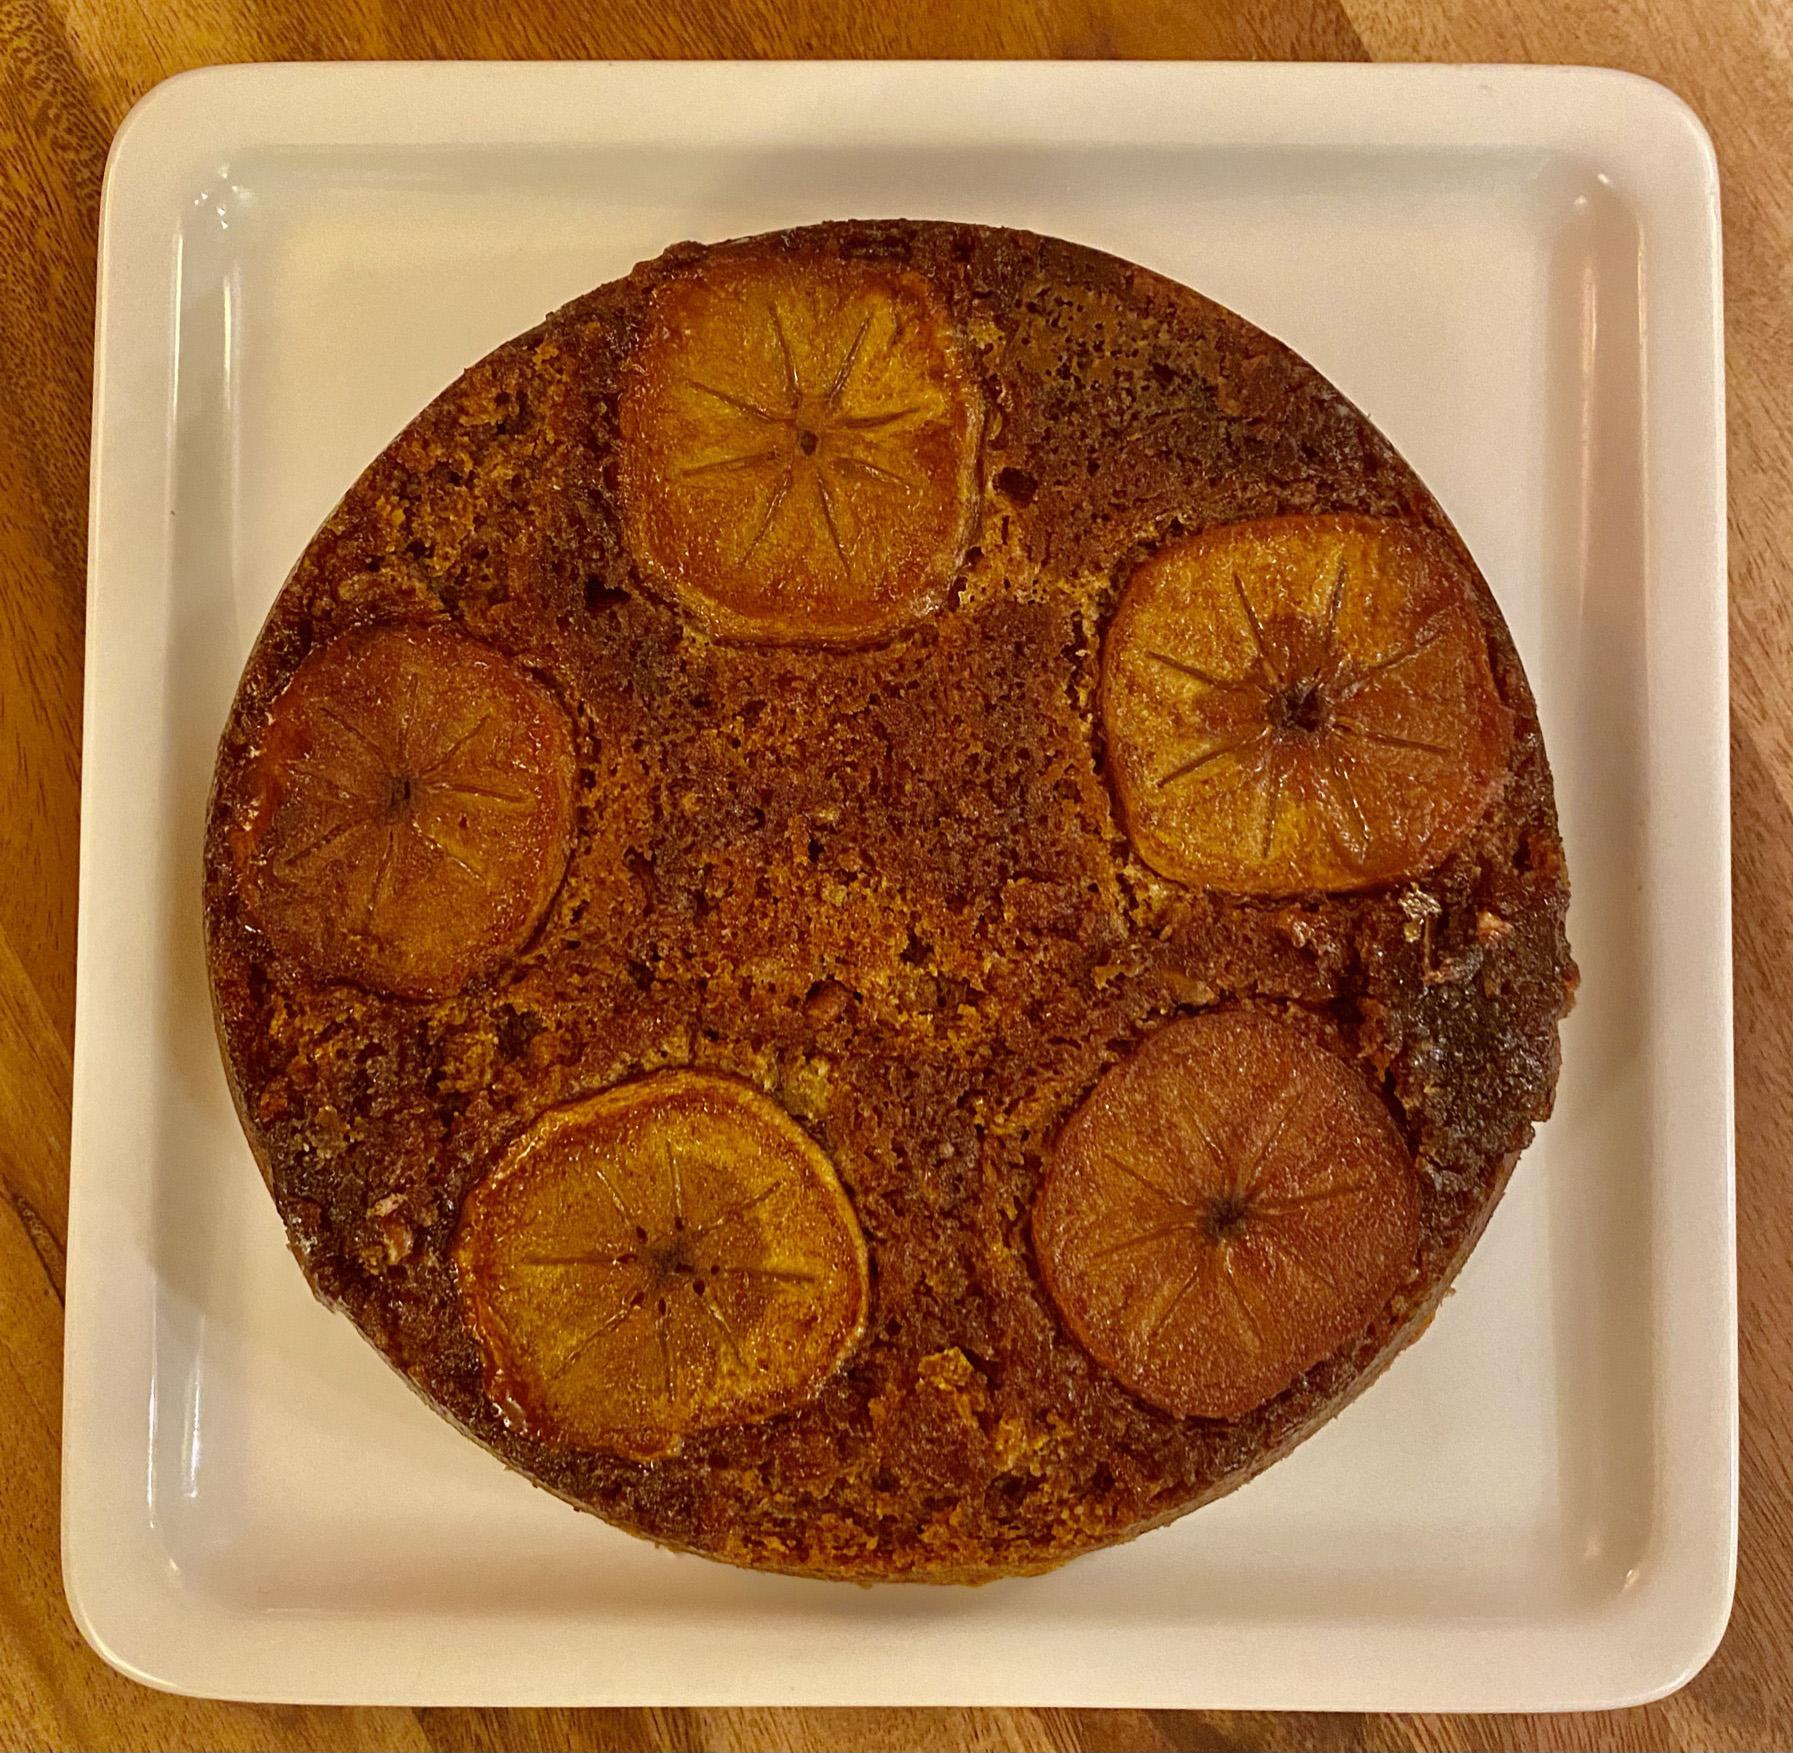 Persimmon Upside Down Cake Edward Salm